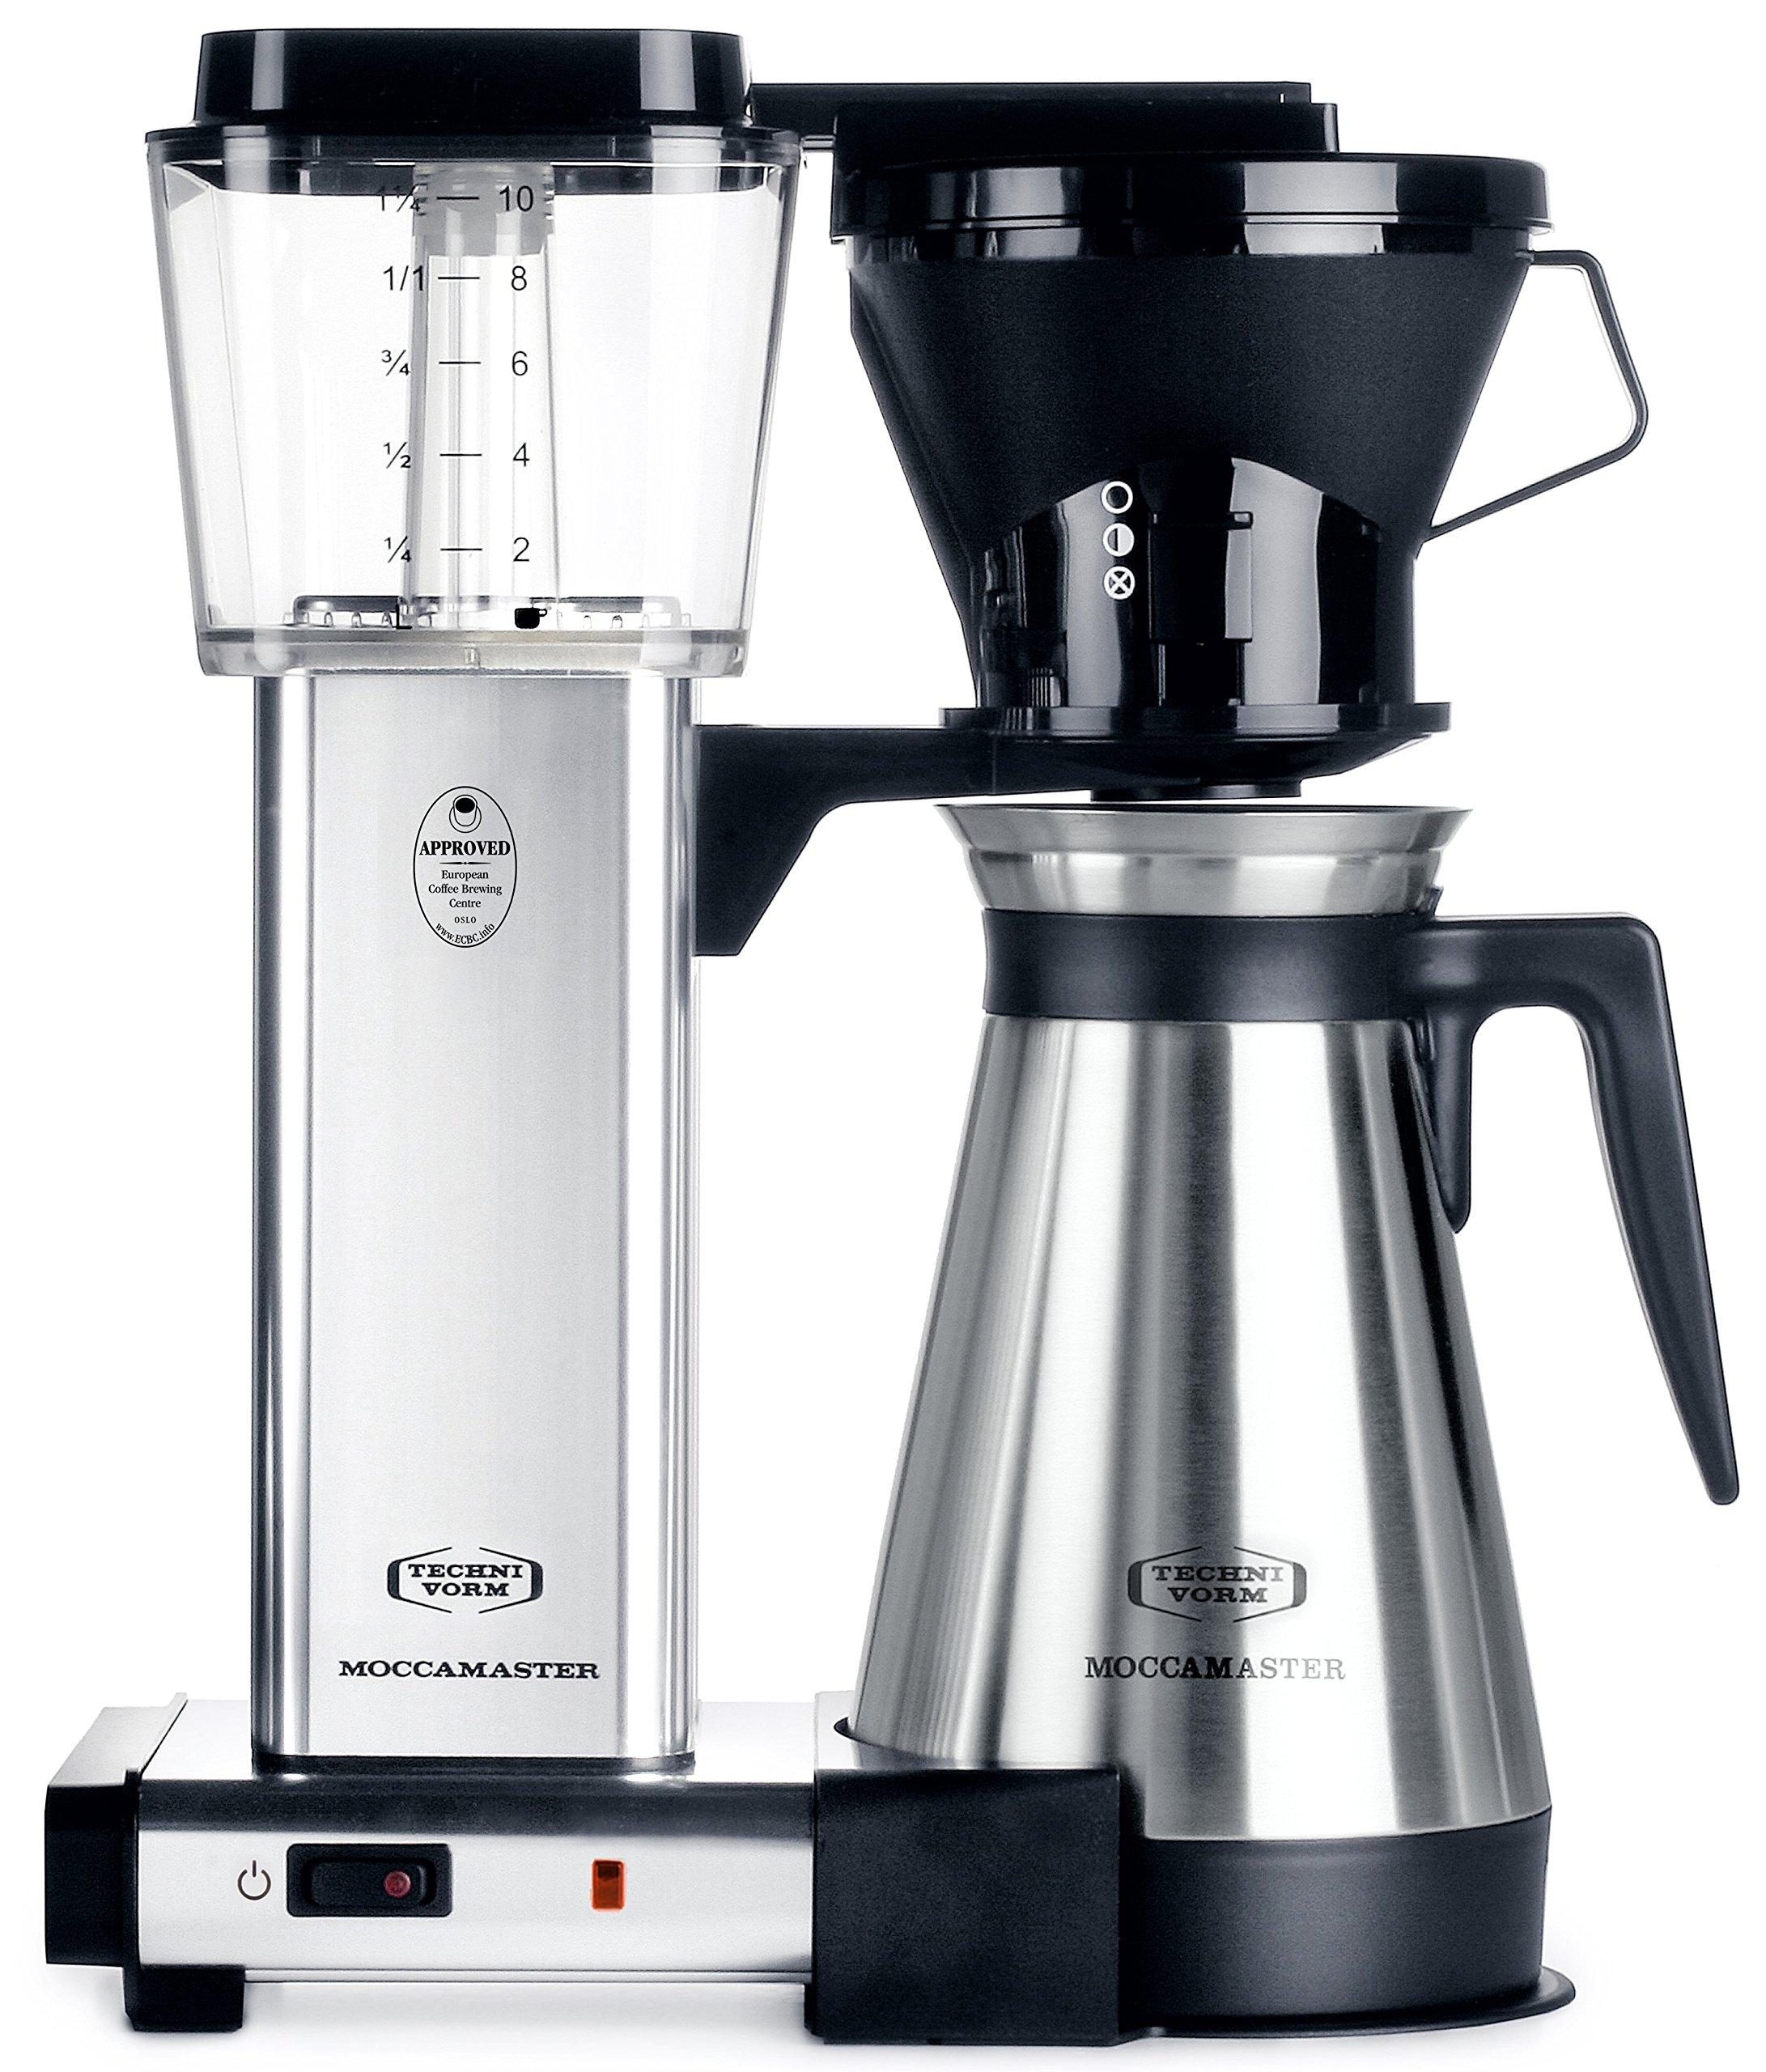 Technivorm Moccamaster 79112 KBT Coffee Brewer, 40 oz, Polished Silver